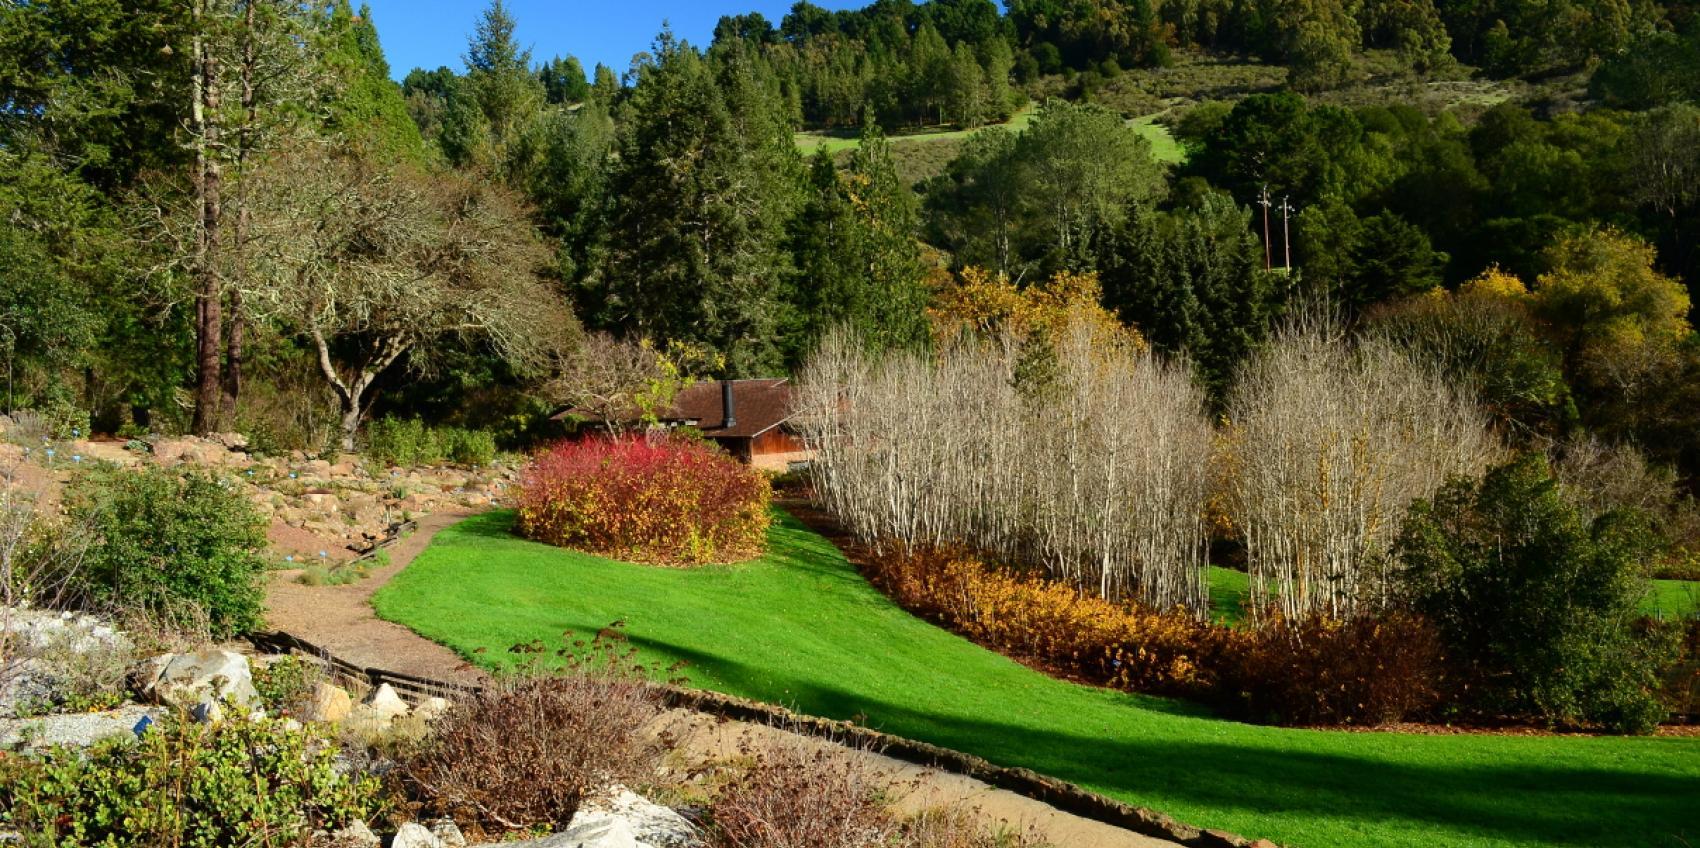 Regional Parks Botanic Garden American Public Gardens Association